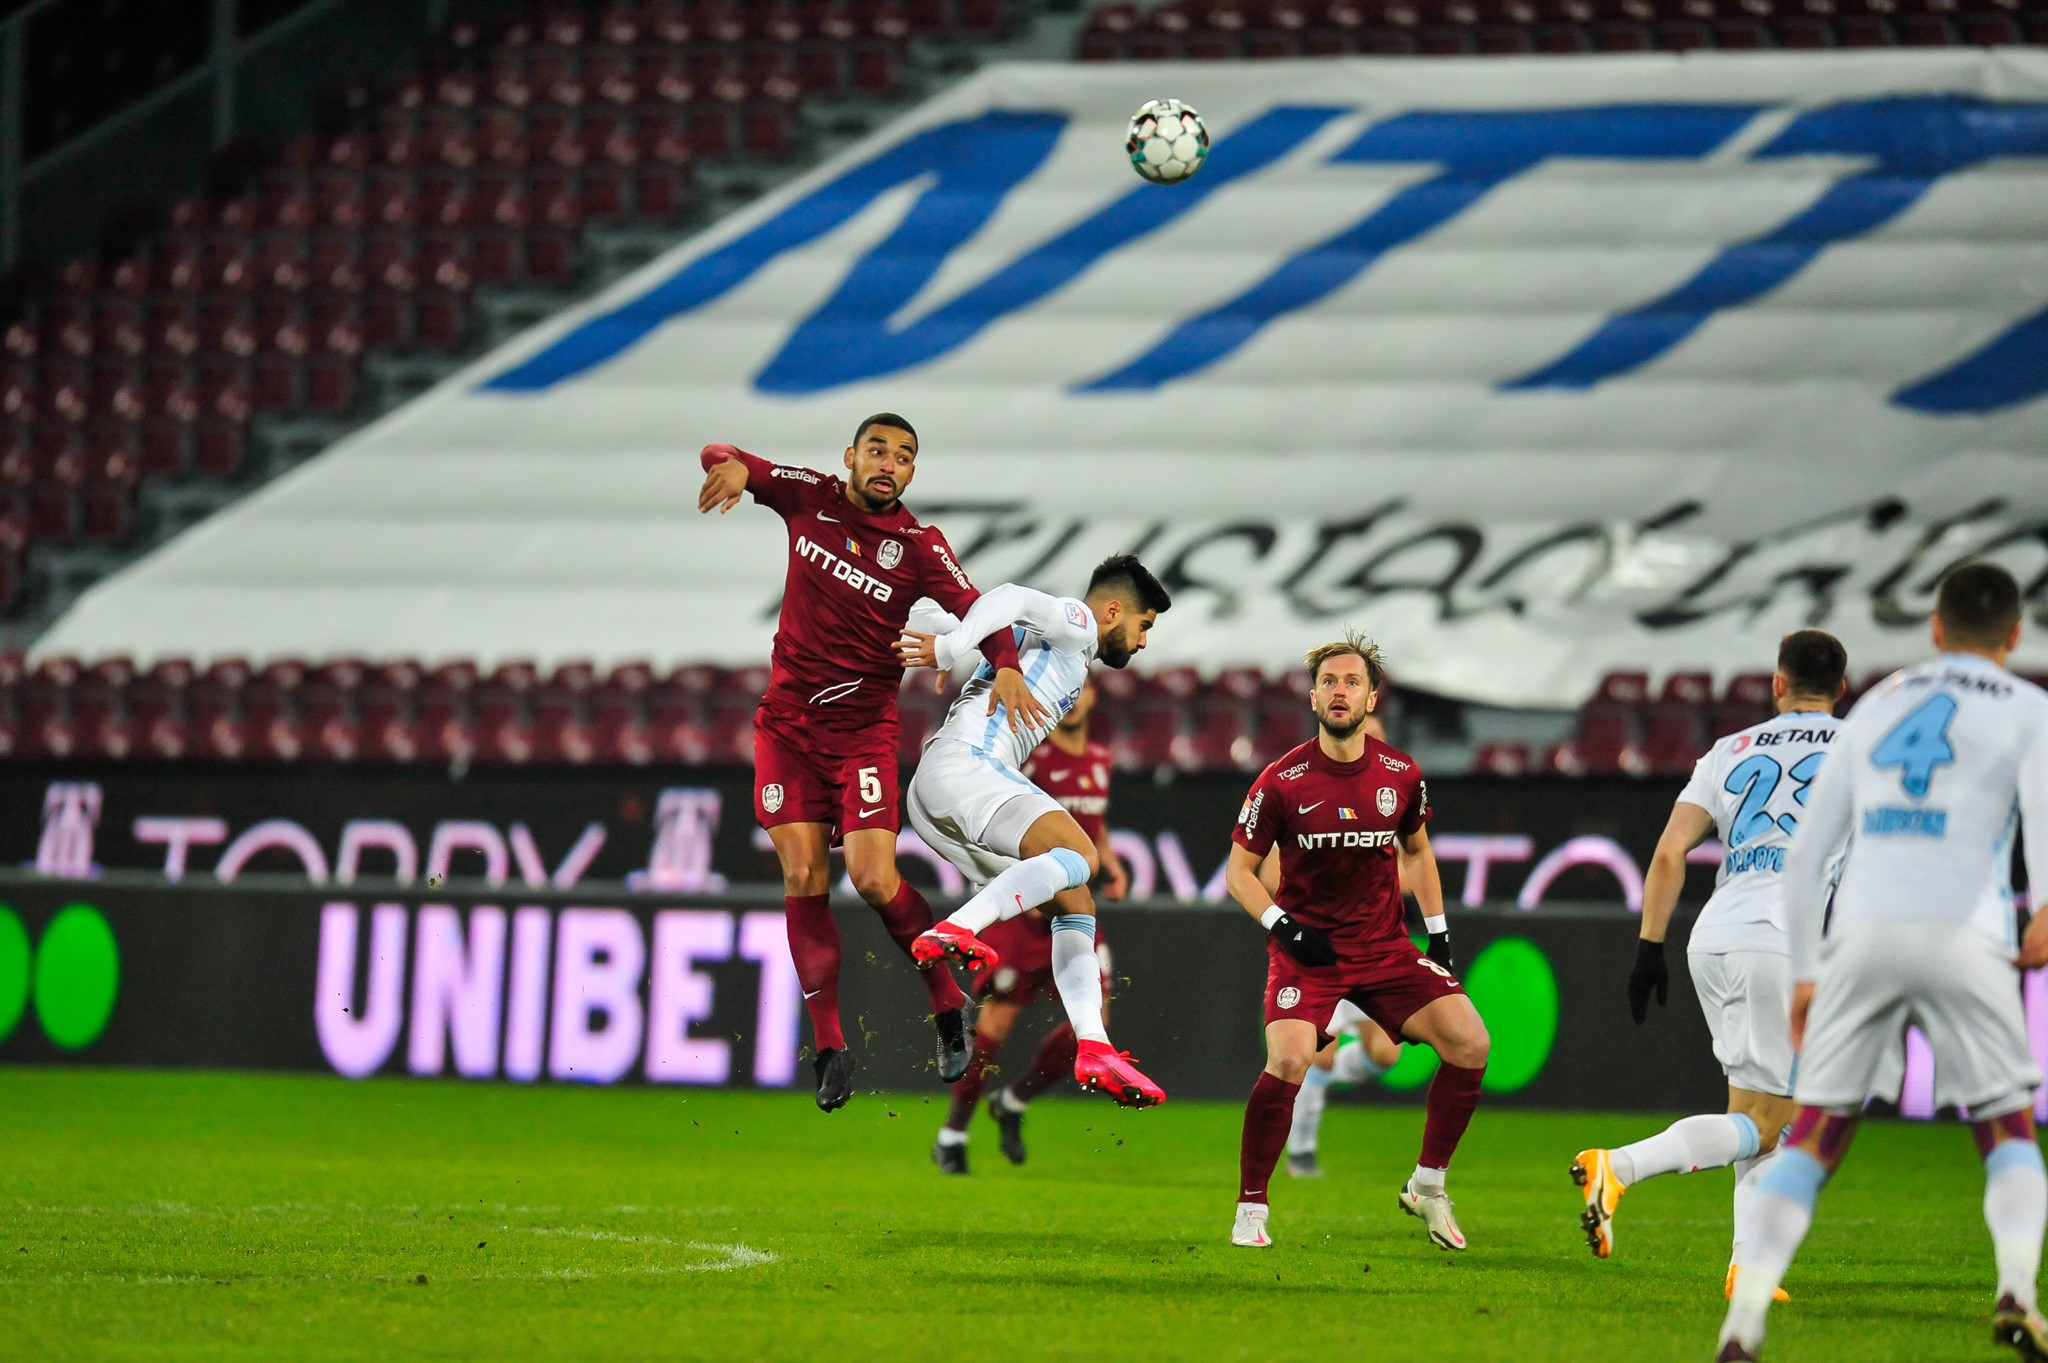 CFR Cluj 2